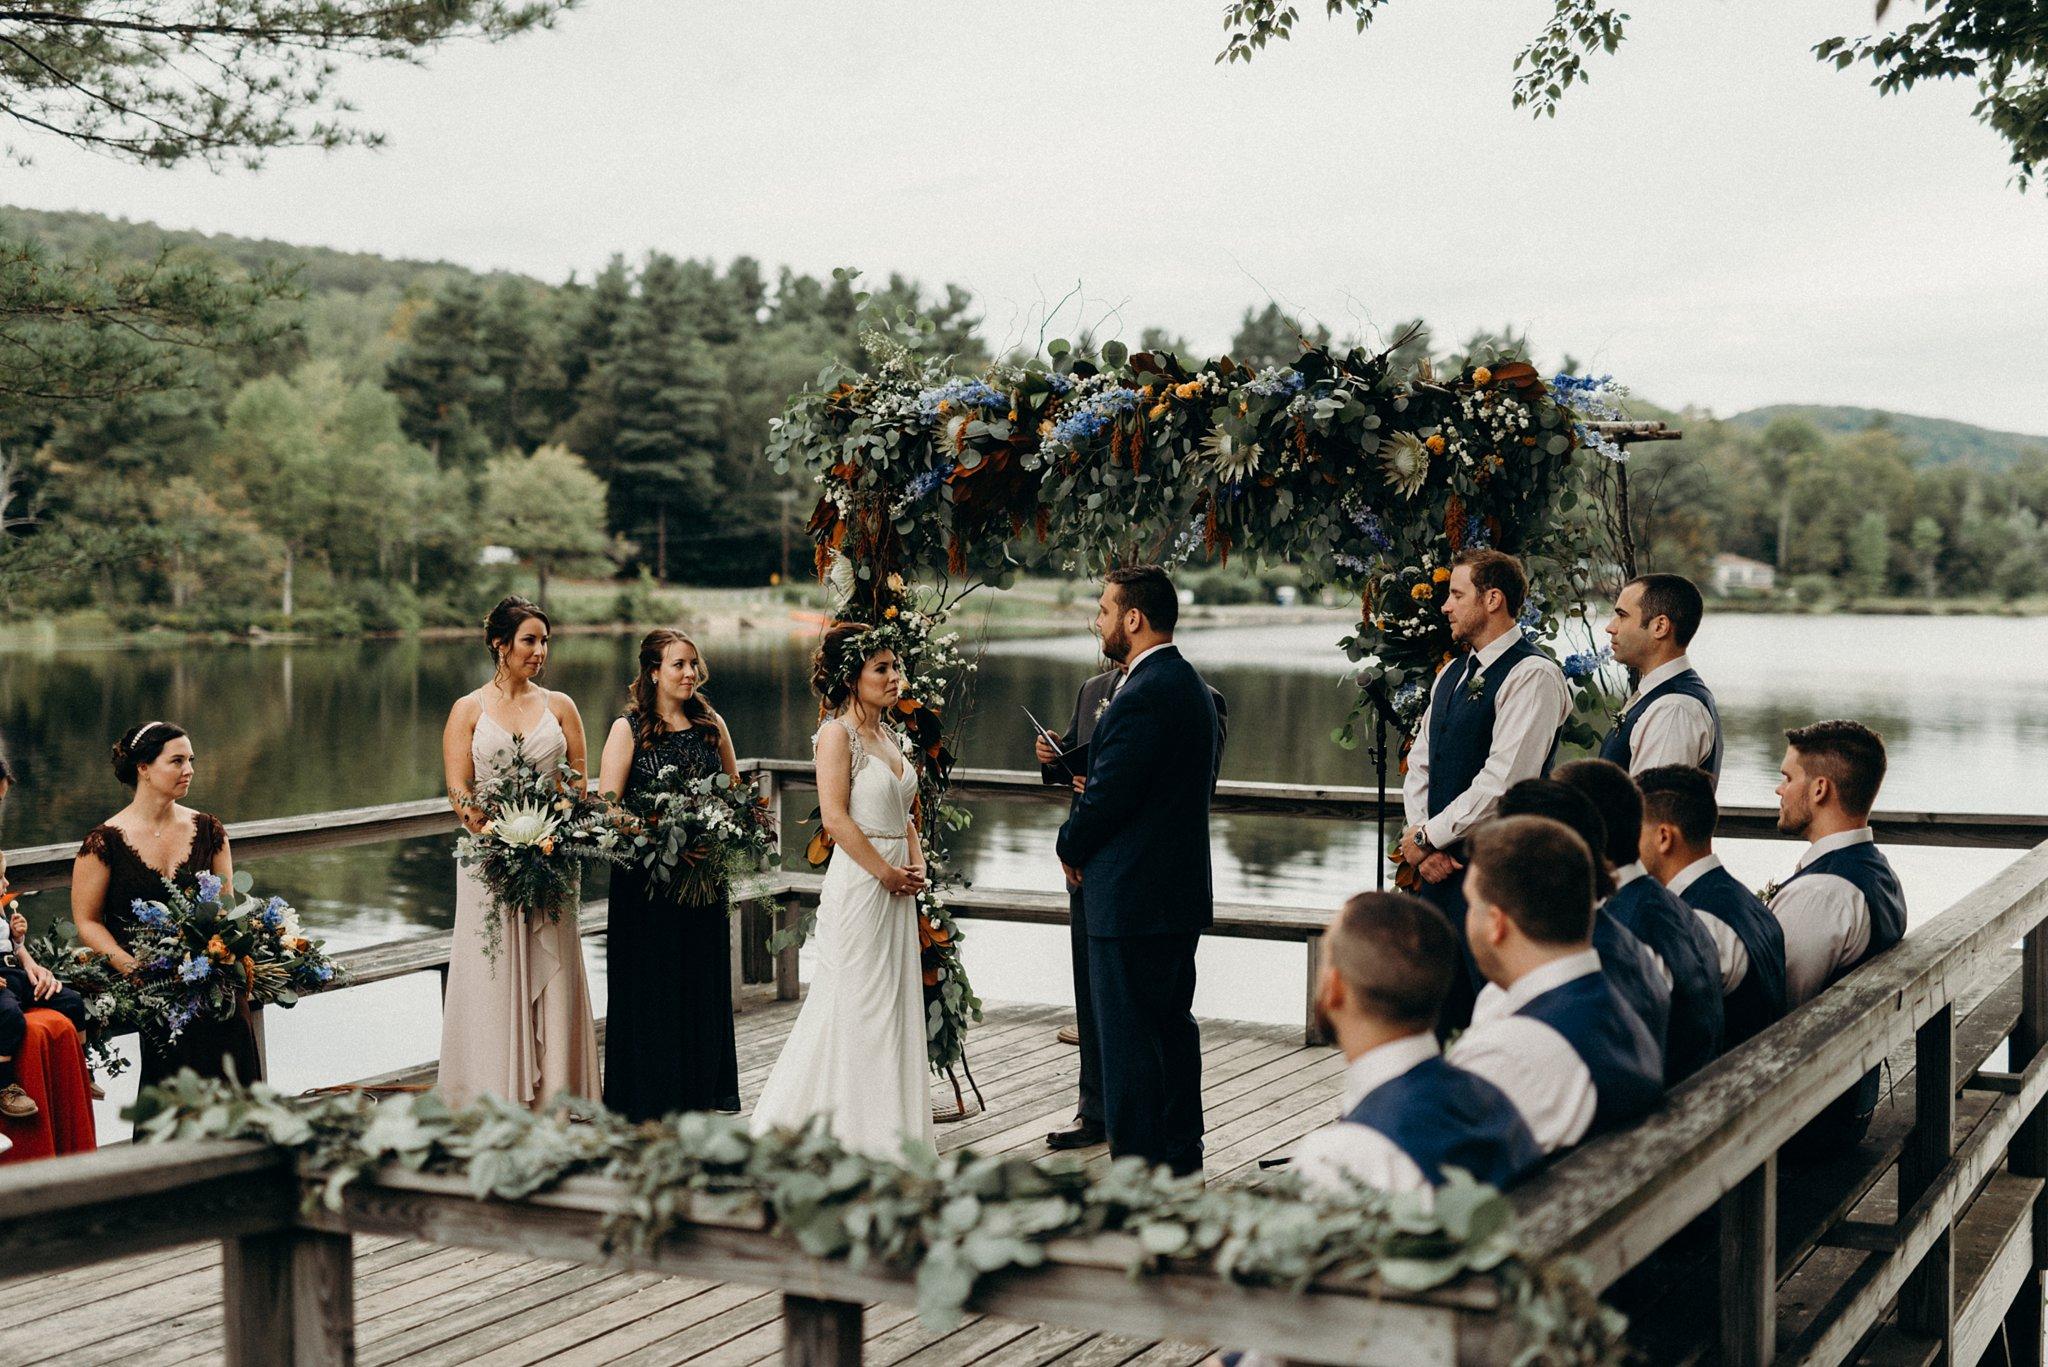 kaihla_tonai_intimate_wedding_elopement_photographer_6627.jpg